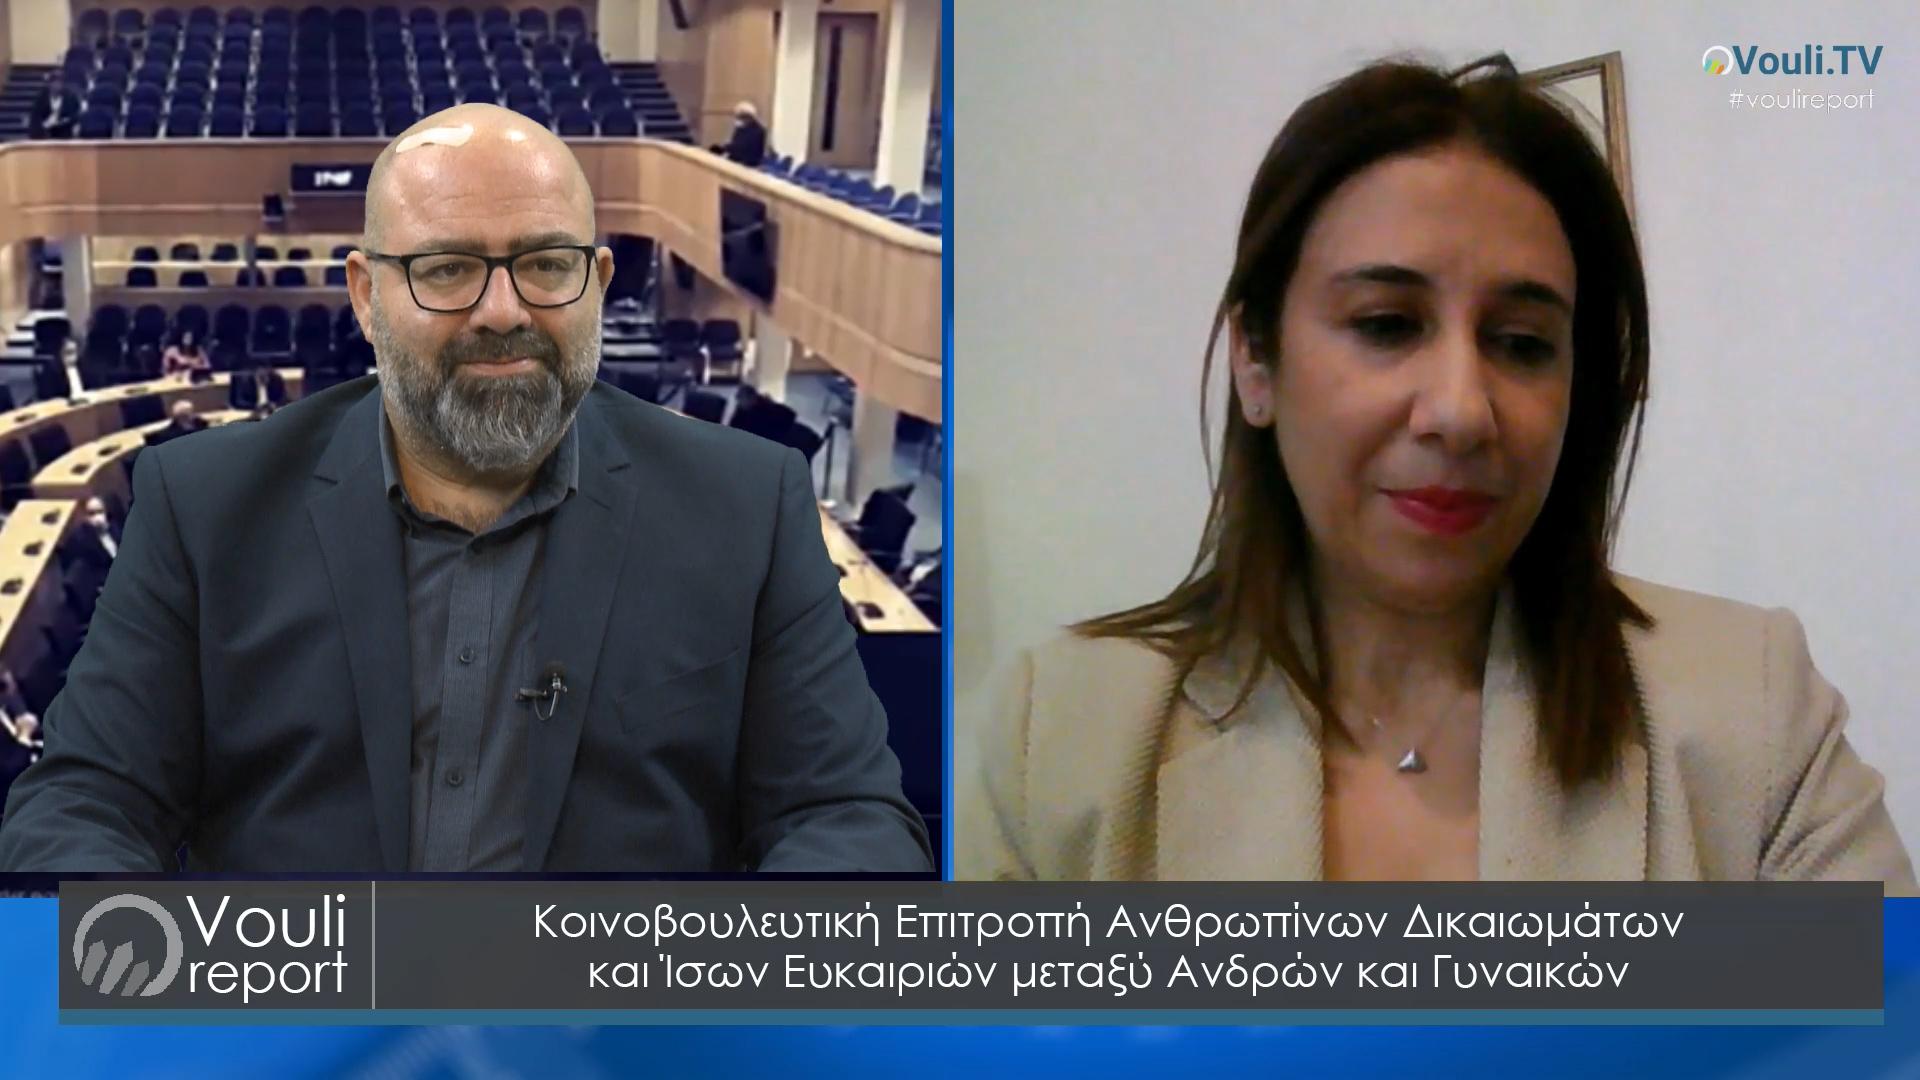 Vouli report - 07/12/2020   Επιτροπή Ανθρωπίνων Δικαιωμάτων και Ίσων Ευκαιριών μεταξύ Ανδρών και Γυναικών